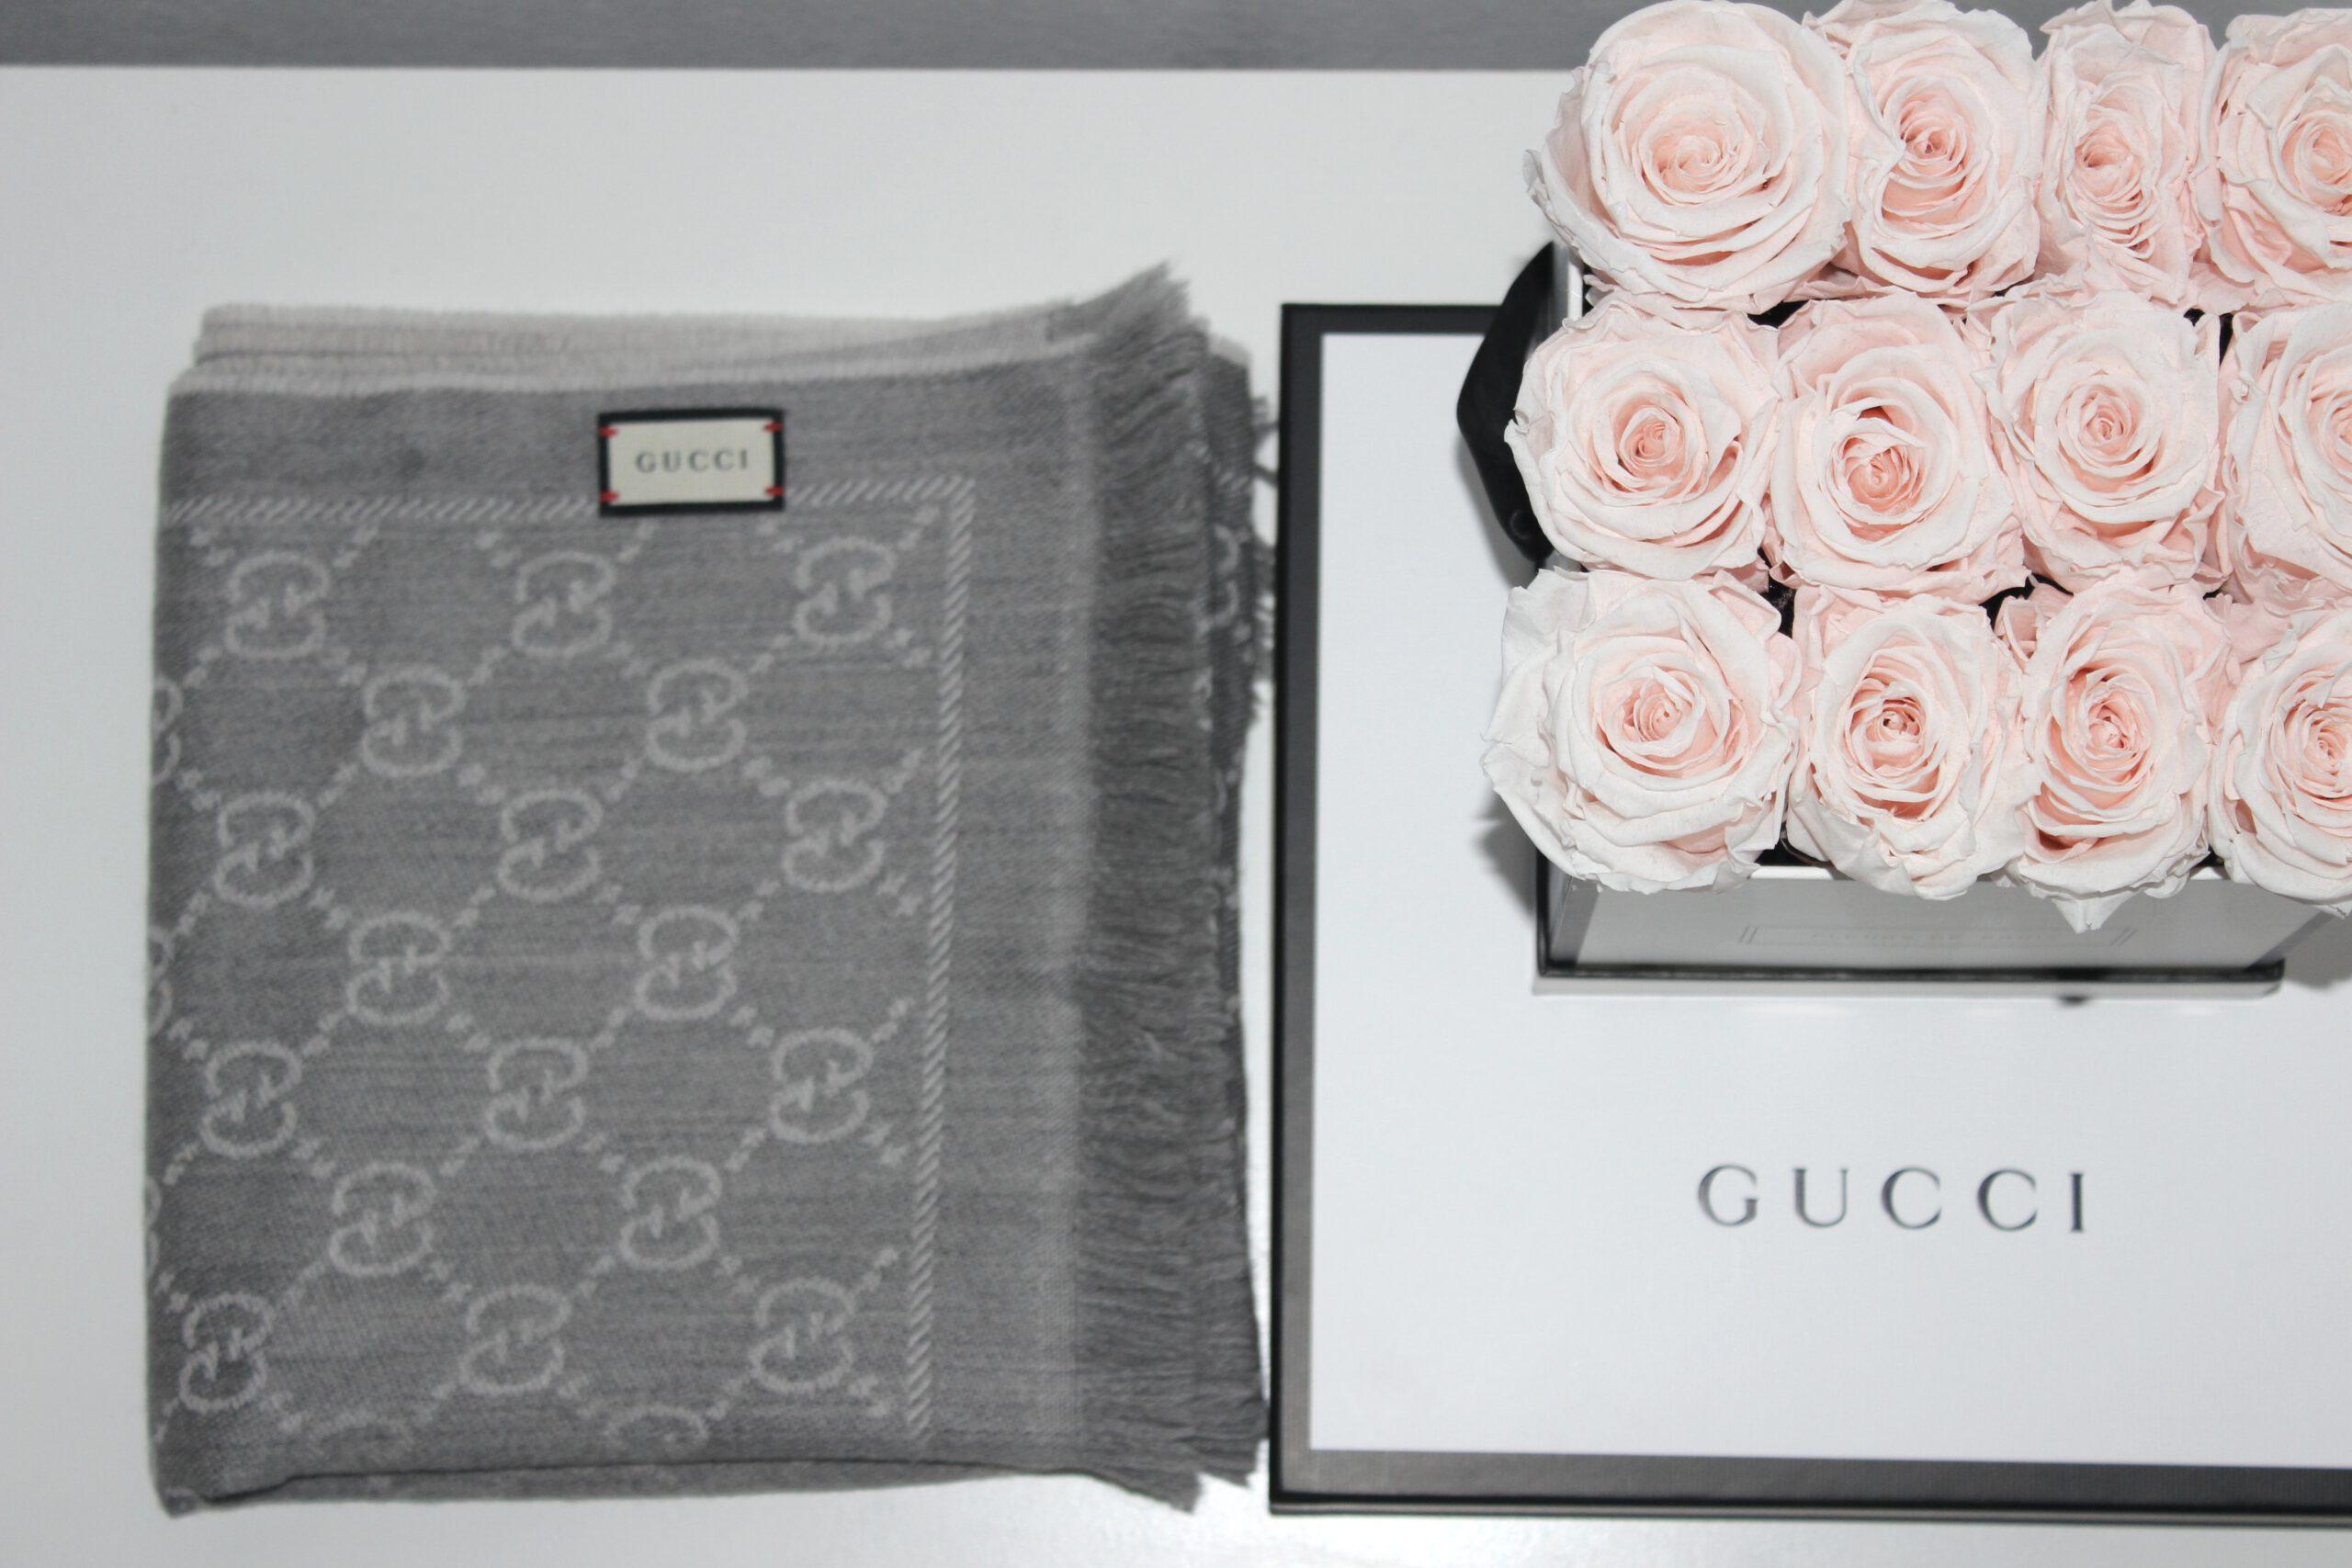 Design Kollektion: Gucci Schal